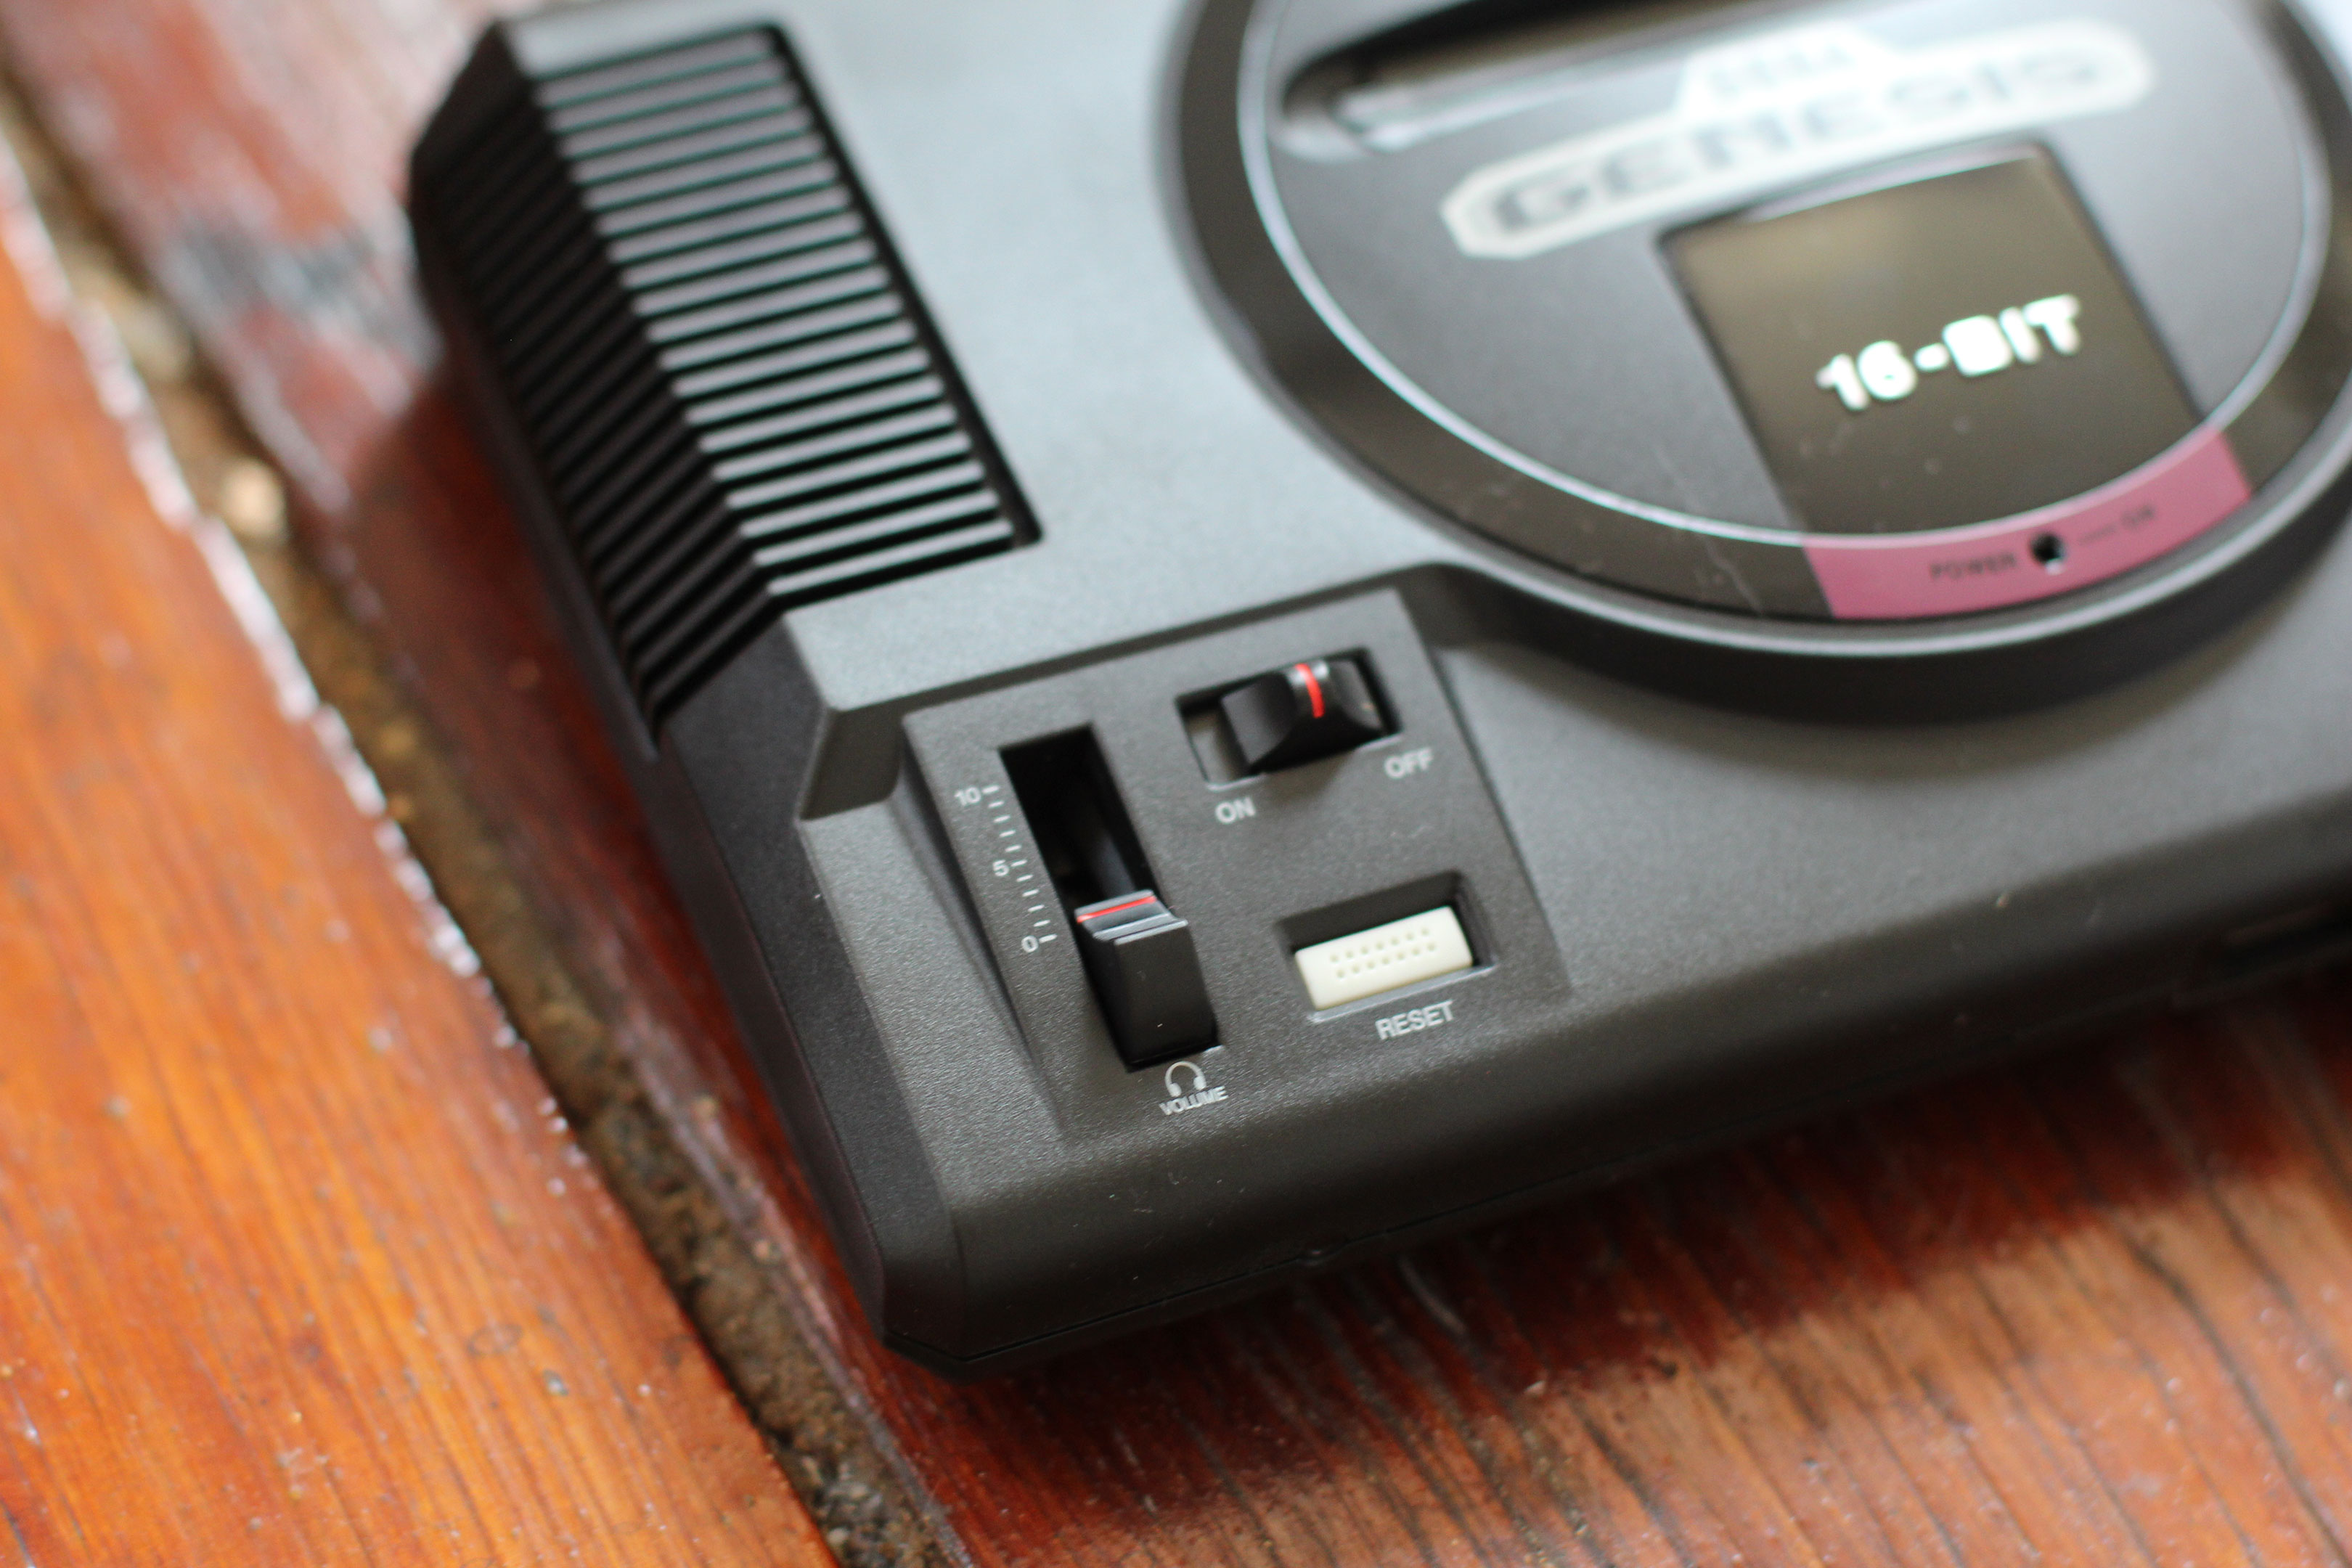 A photo of the Sega Genesis mini console on a hardwood floor.